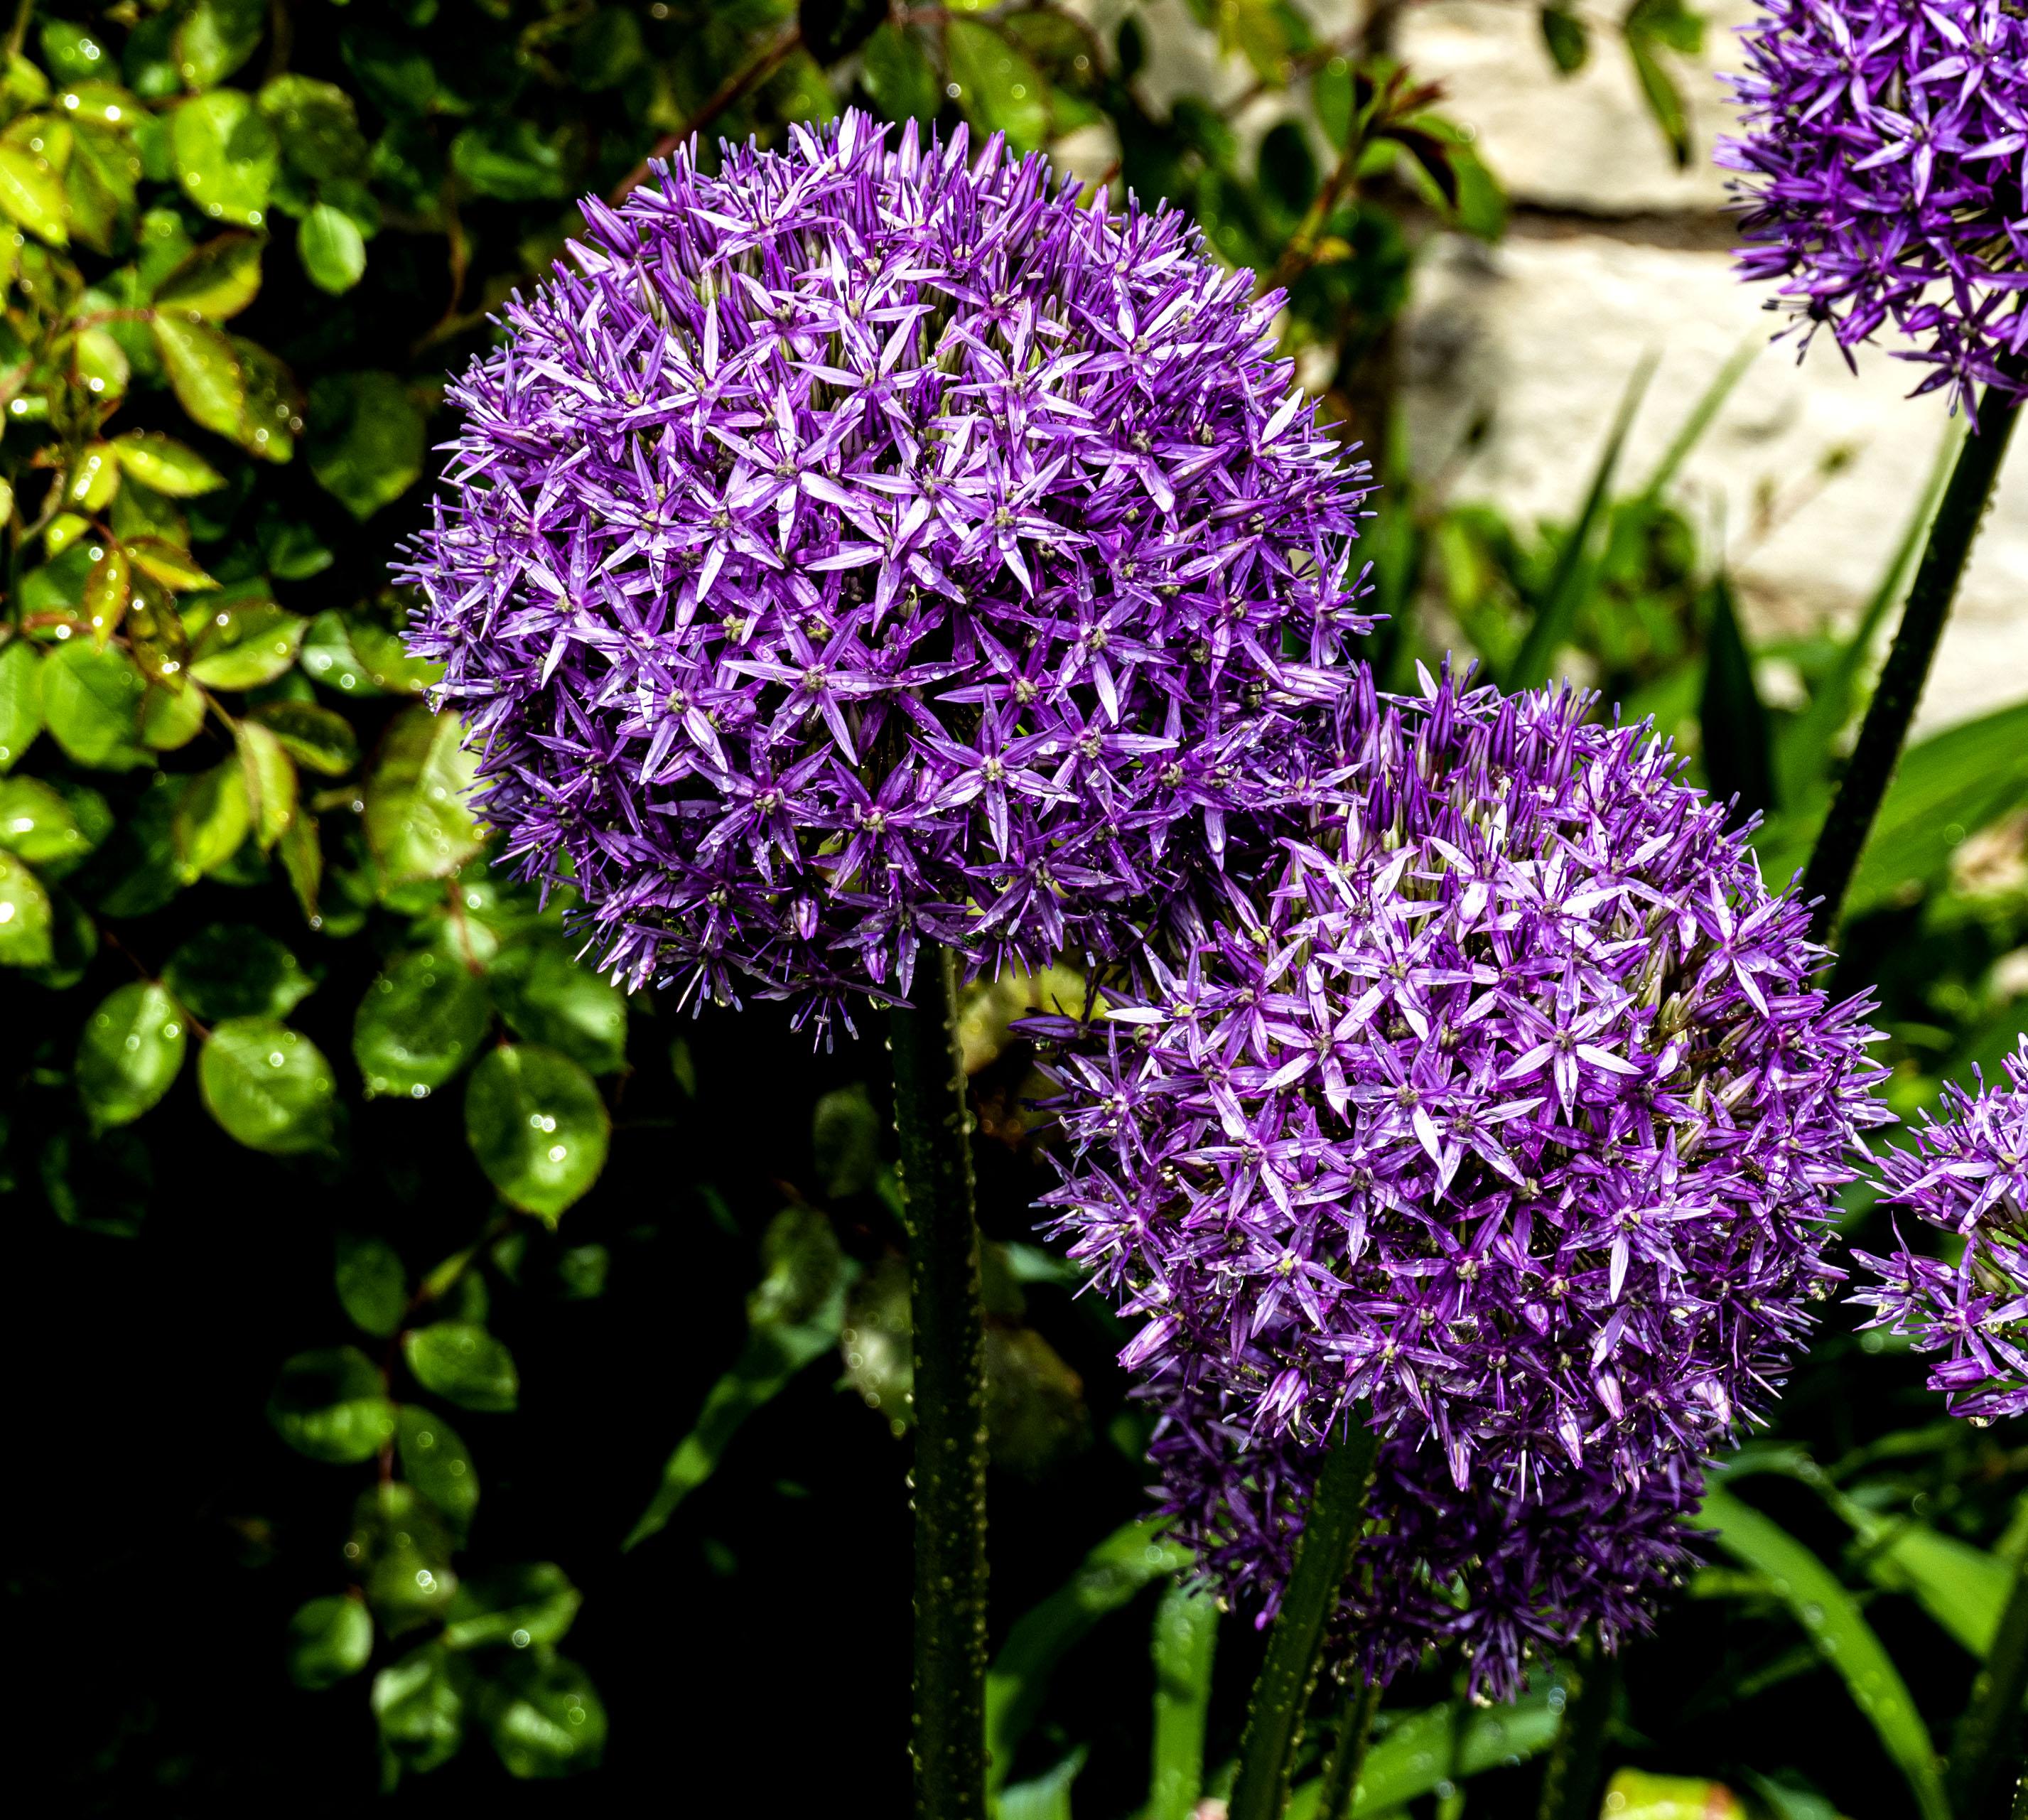 Purple balls copy